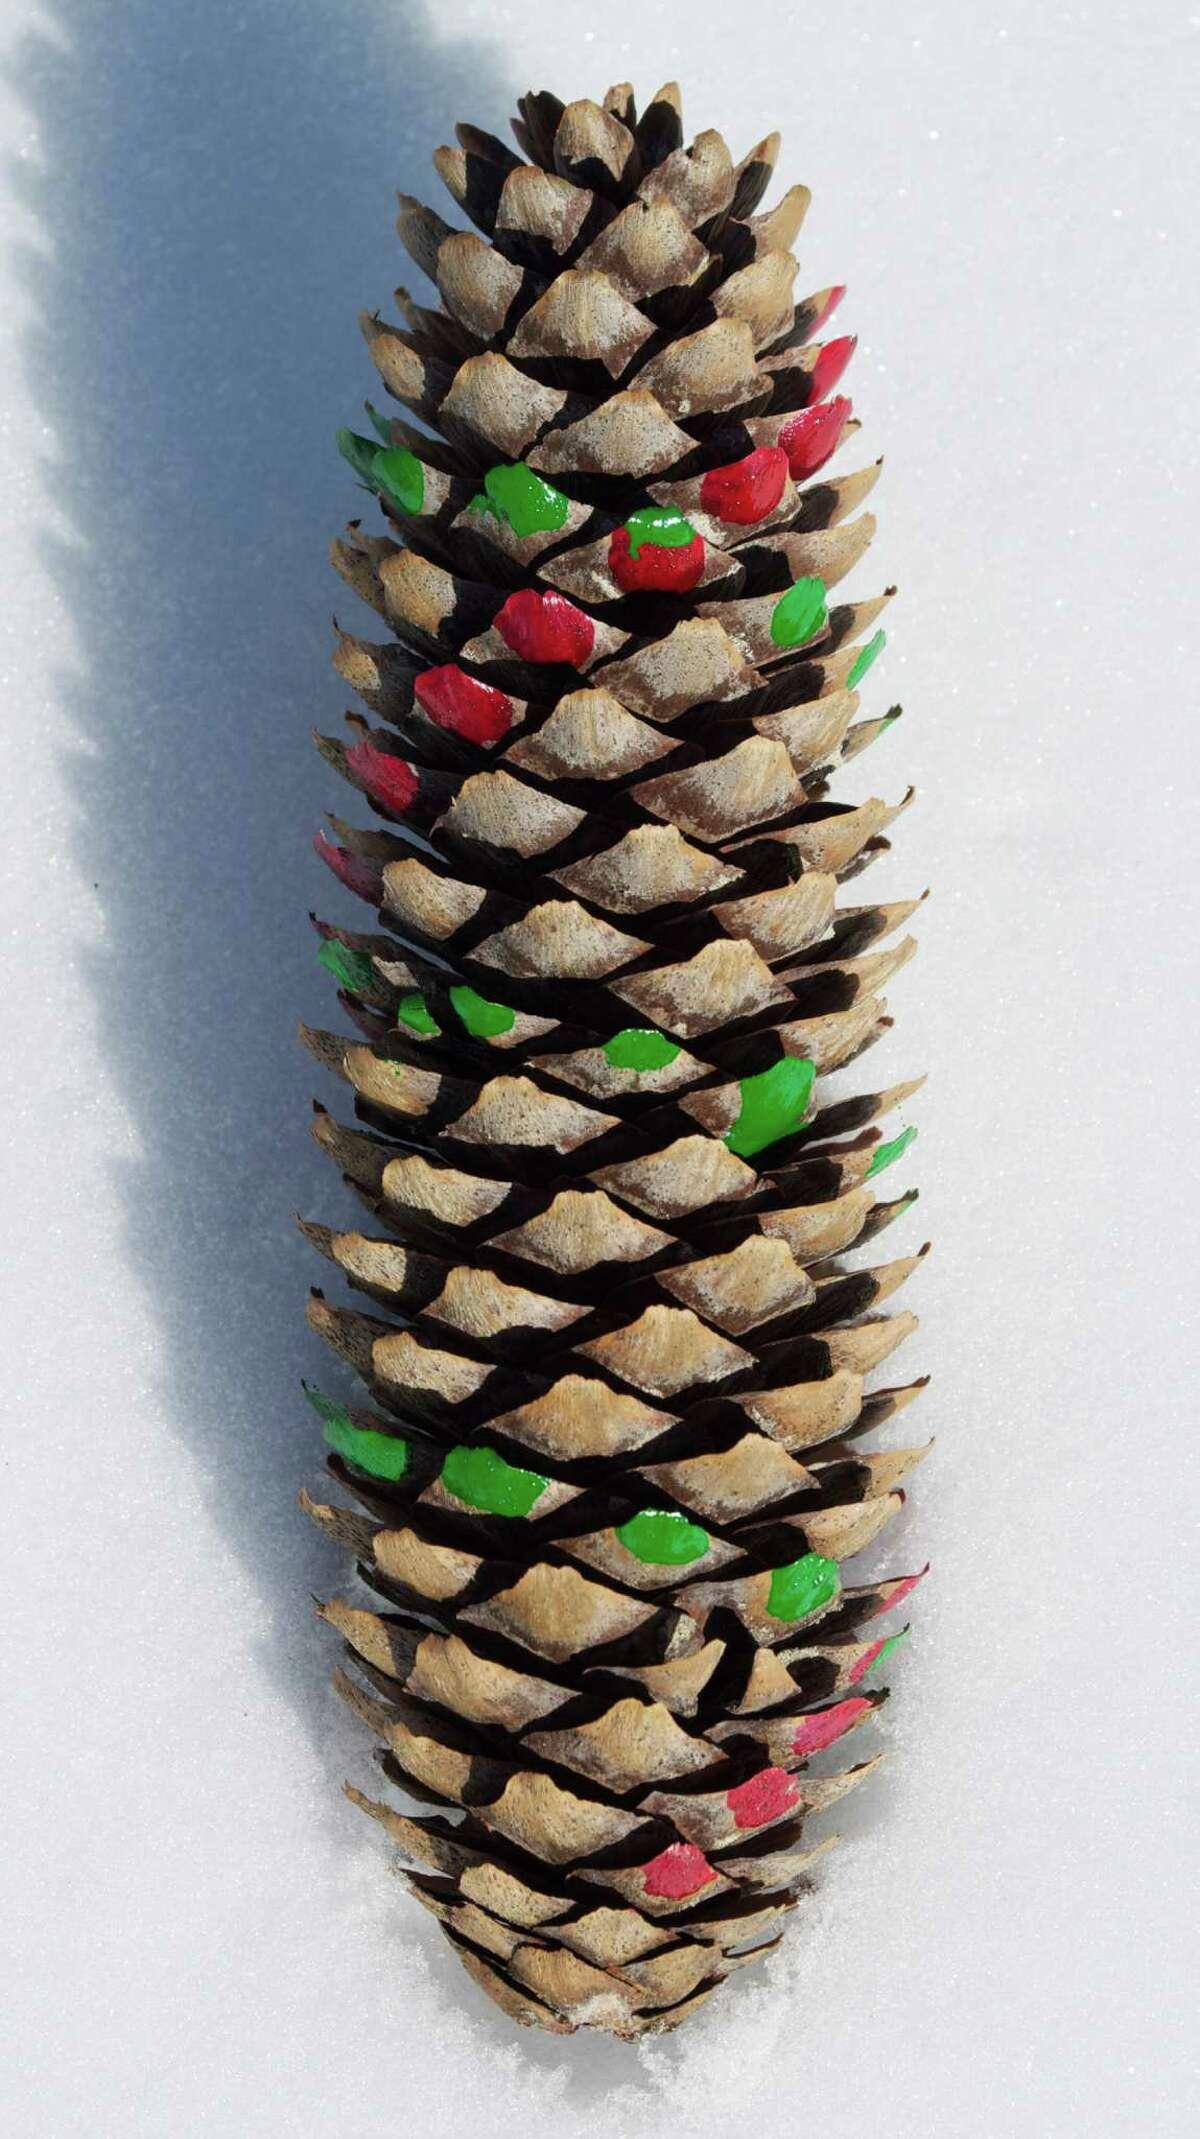 A spruce cone shows a Fibonacci sequence.